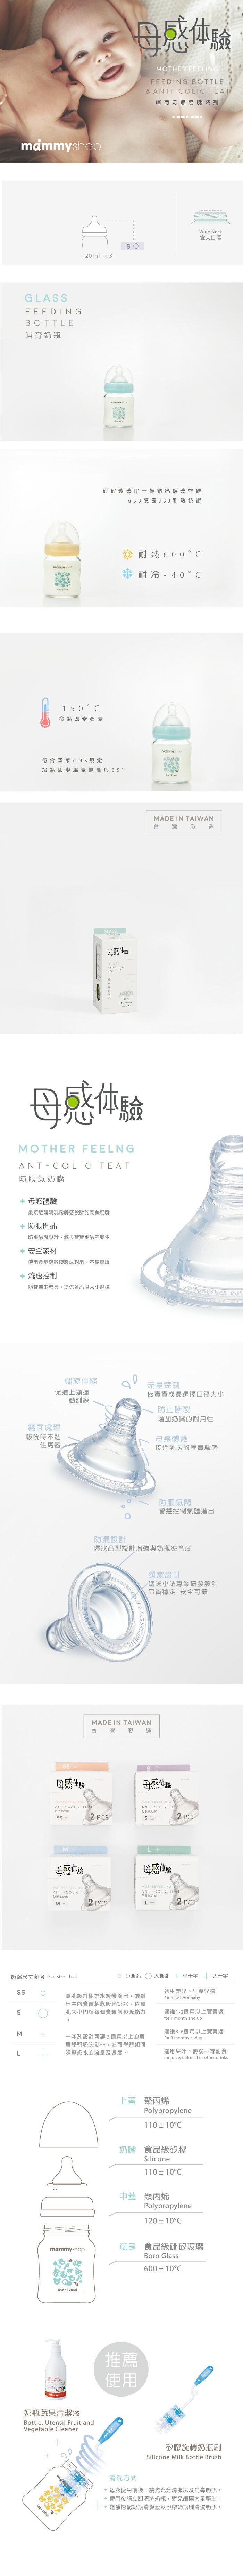 Mammyshop媽咪小站 - 母感體驗 a33玻璃防脹氣奶瓶 寬大口徑 120ml 3入 超值組 1